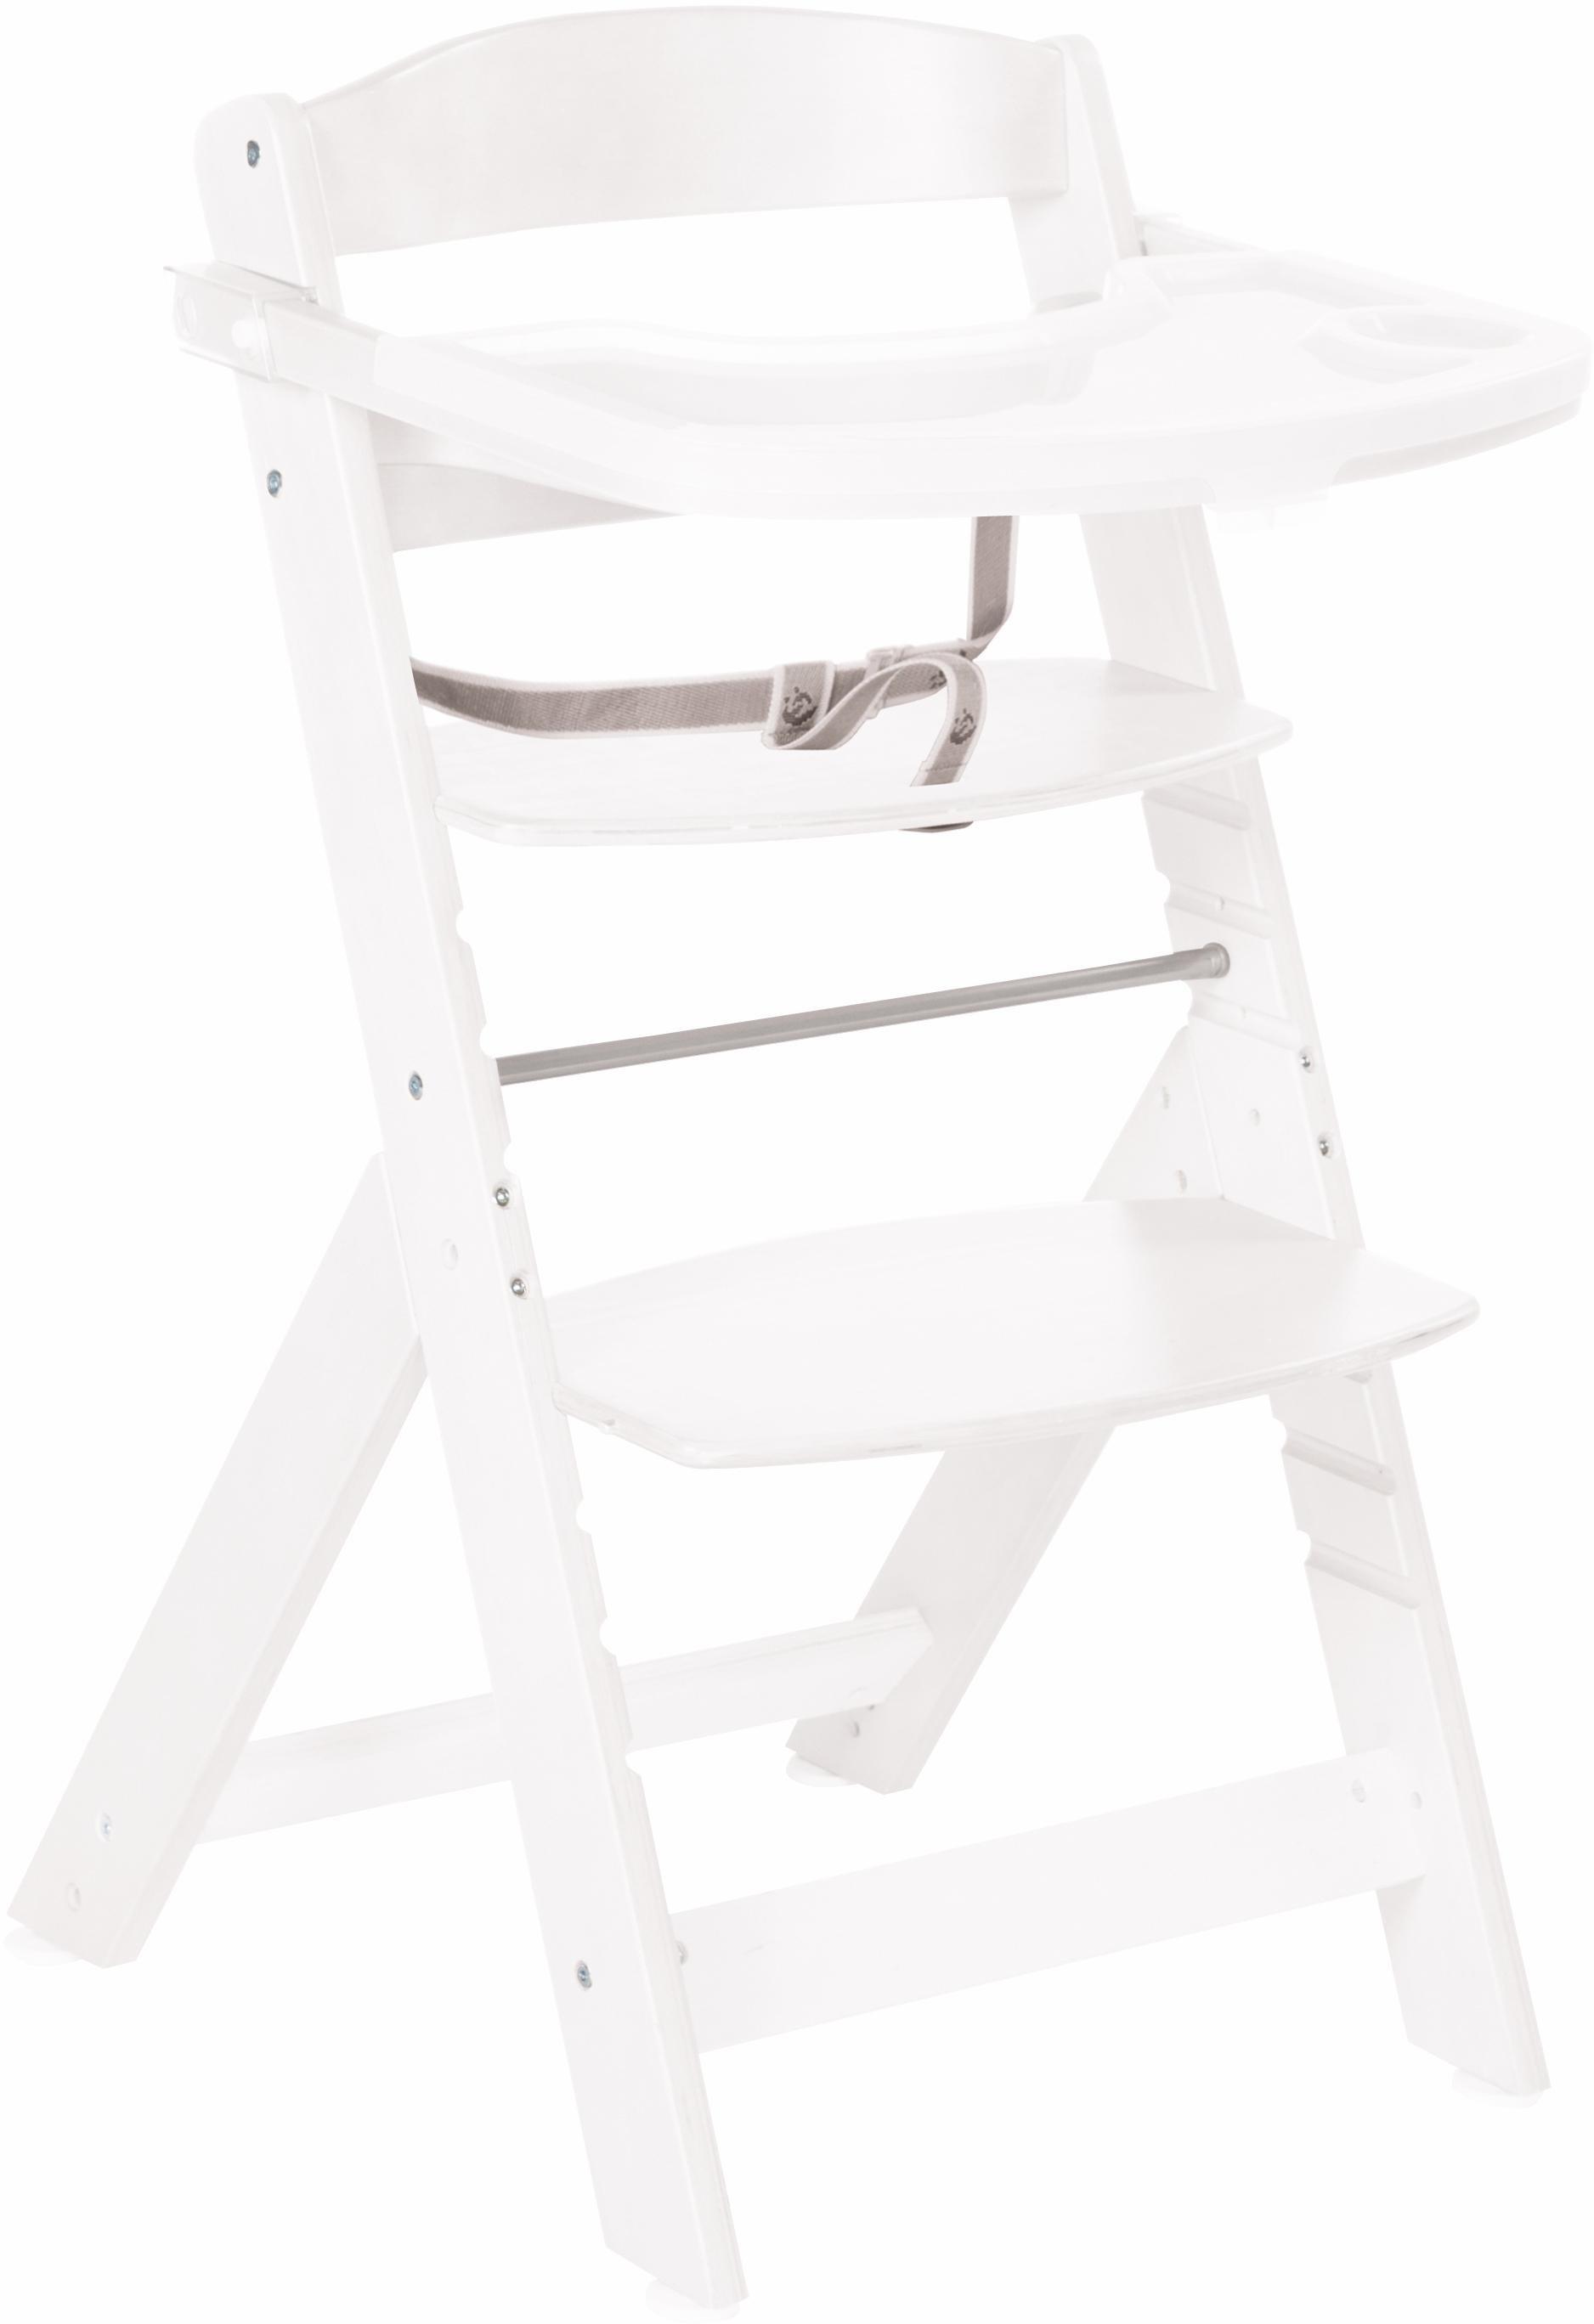 Kinderstoel Wit Hout.Kinderstoel Van Hout Meegroeistoel Sit Up Super Maxi Wit